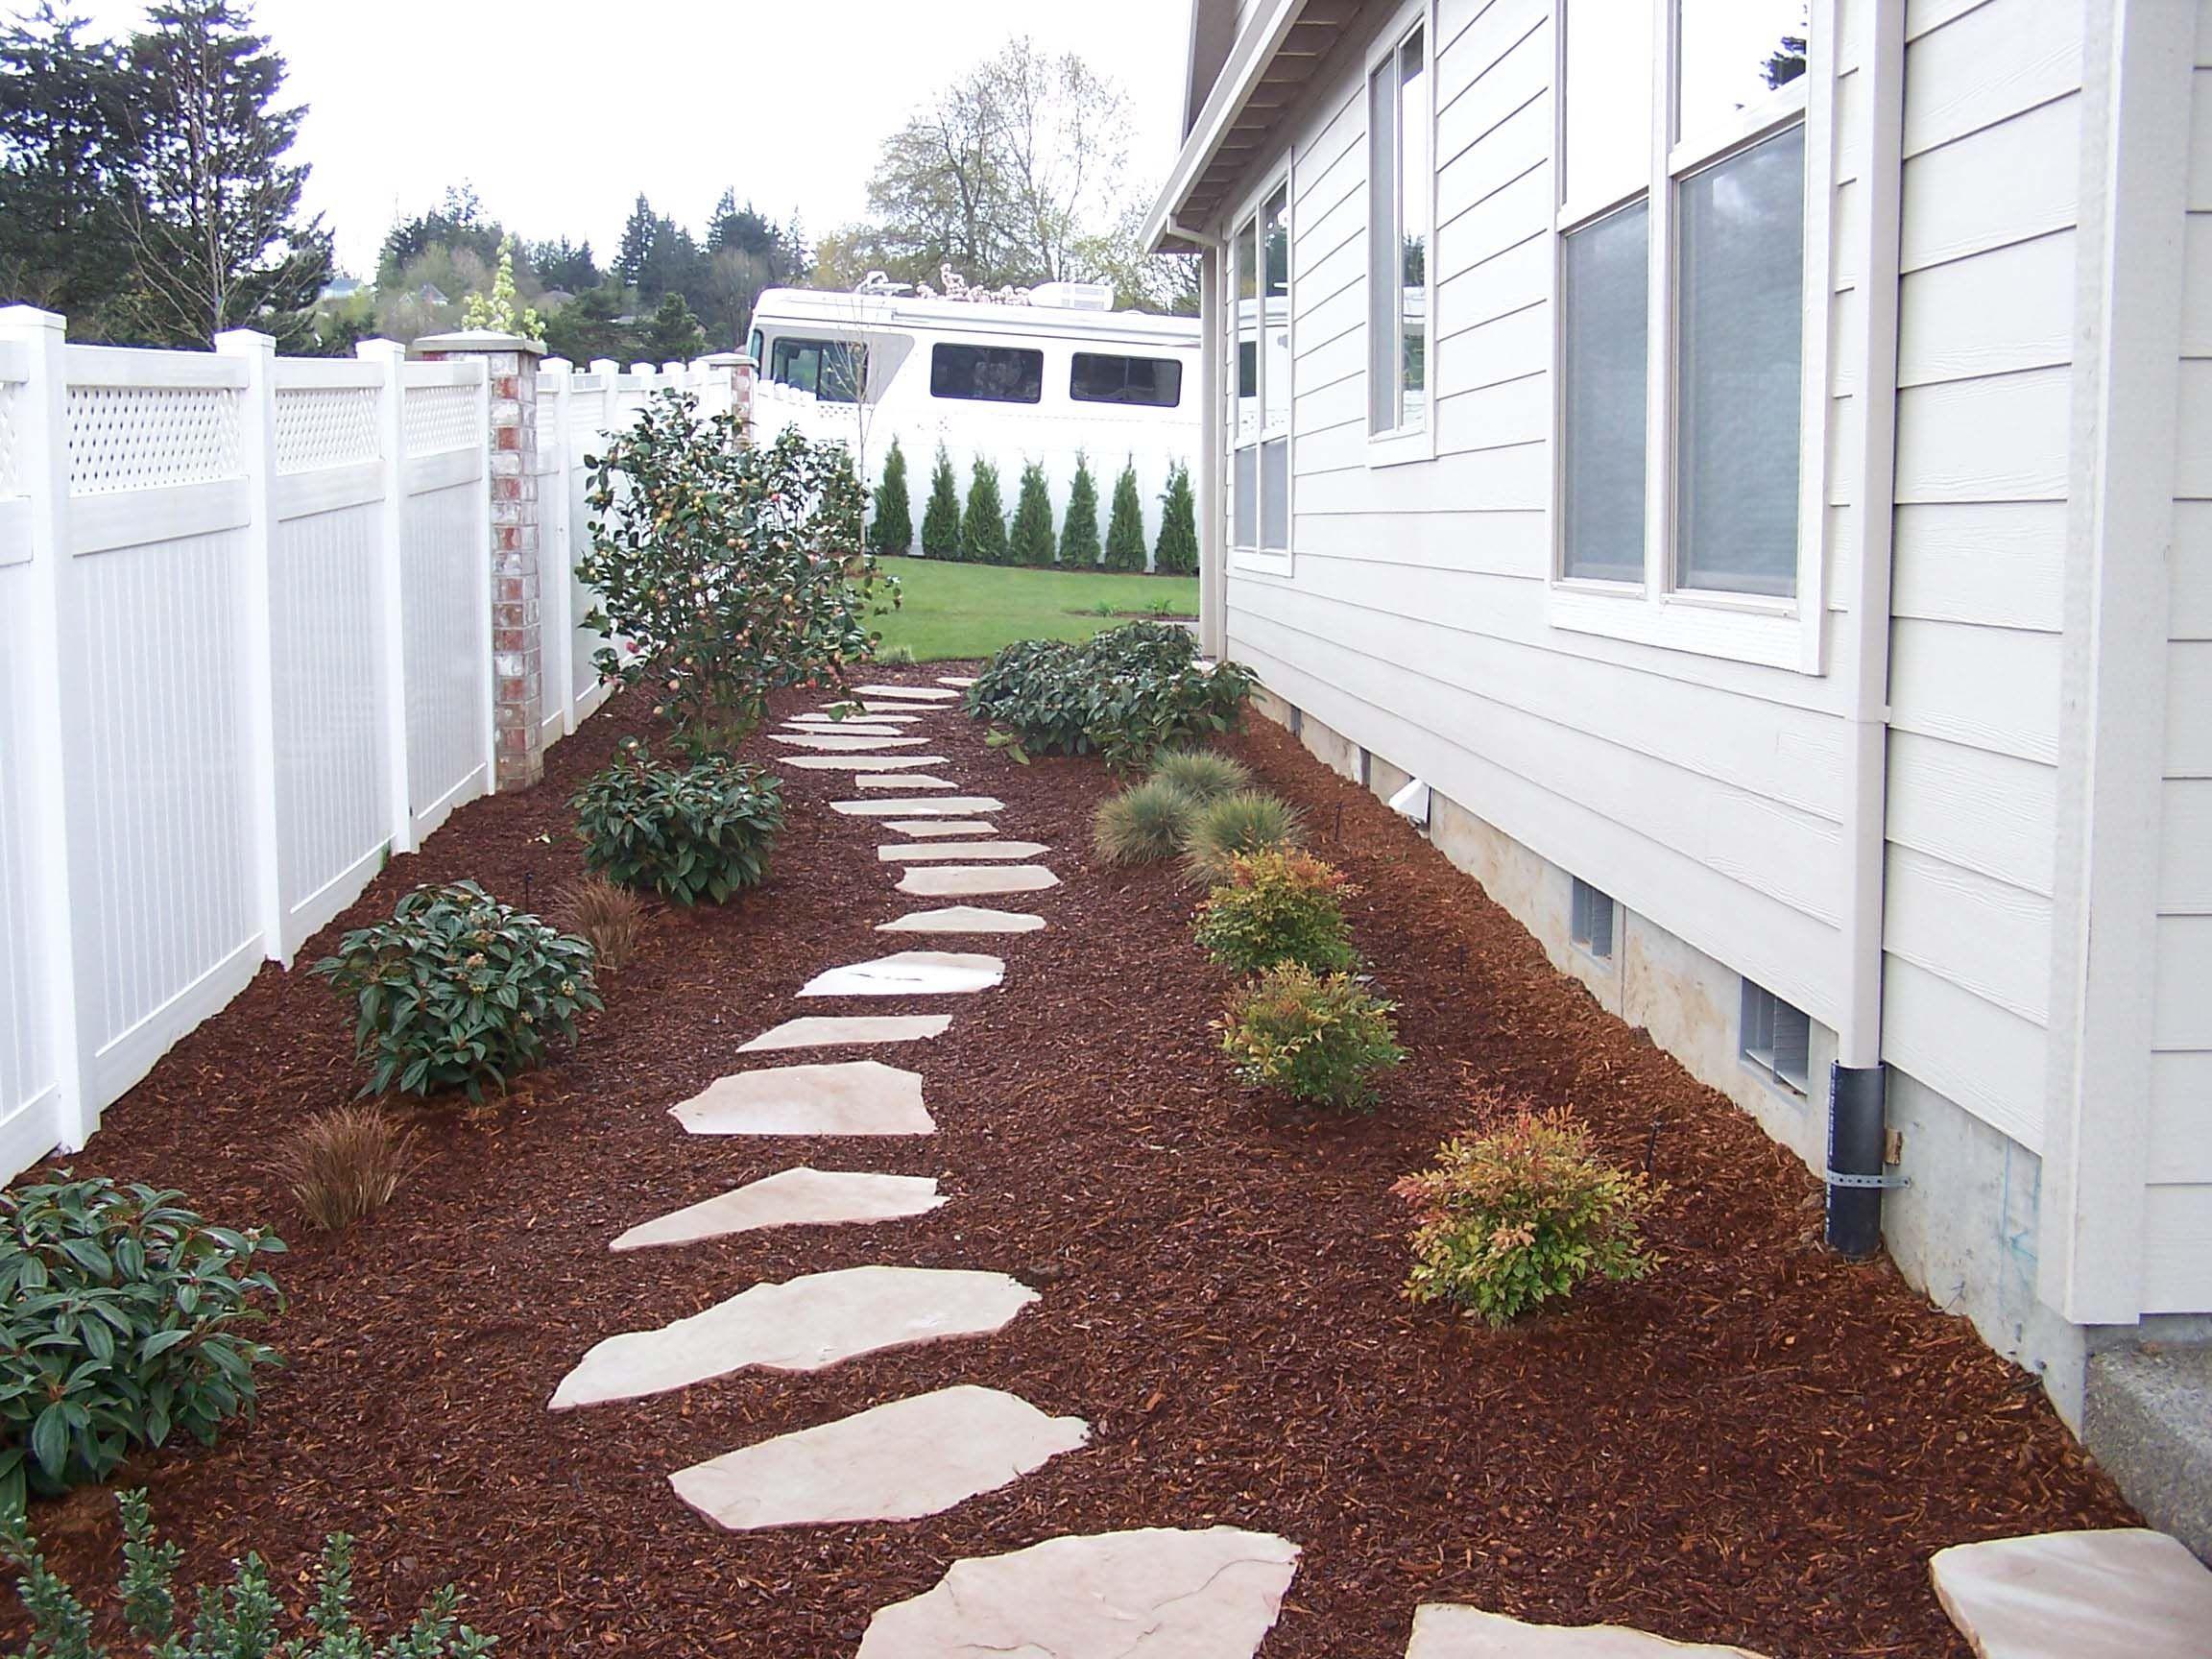 sideyard idea kensington. prefer